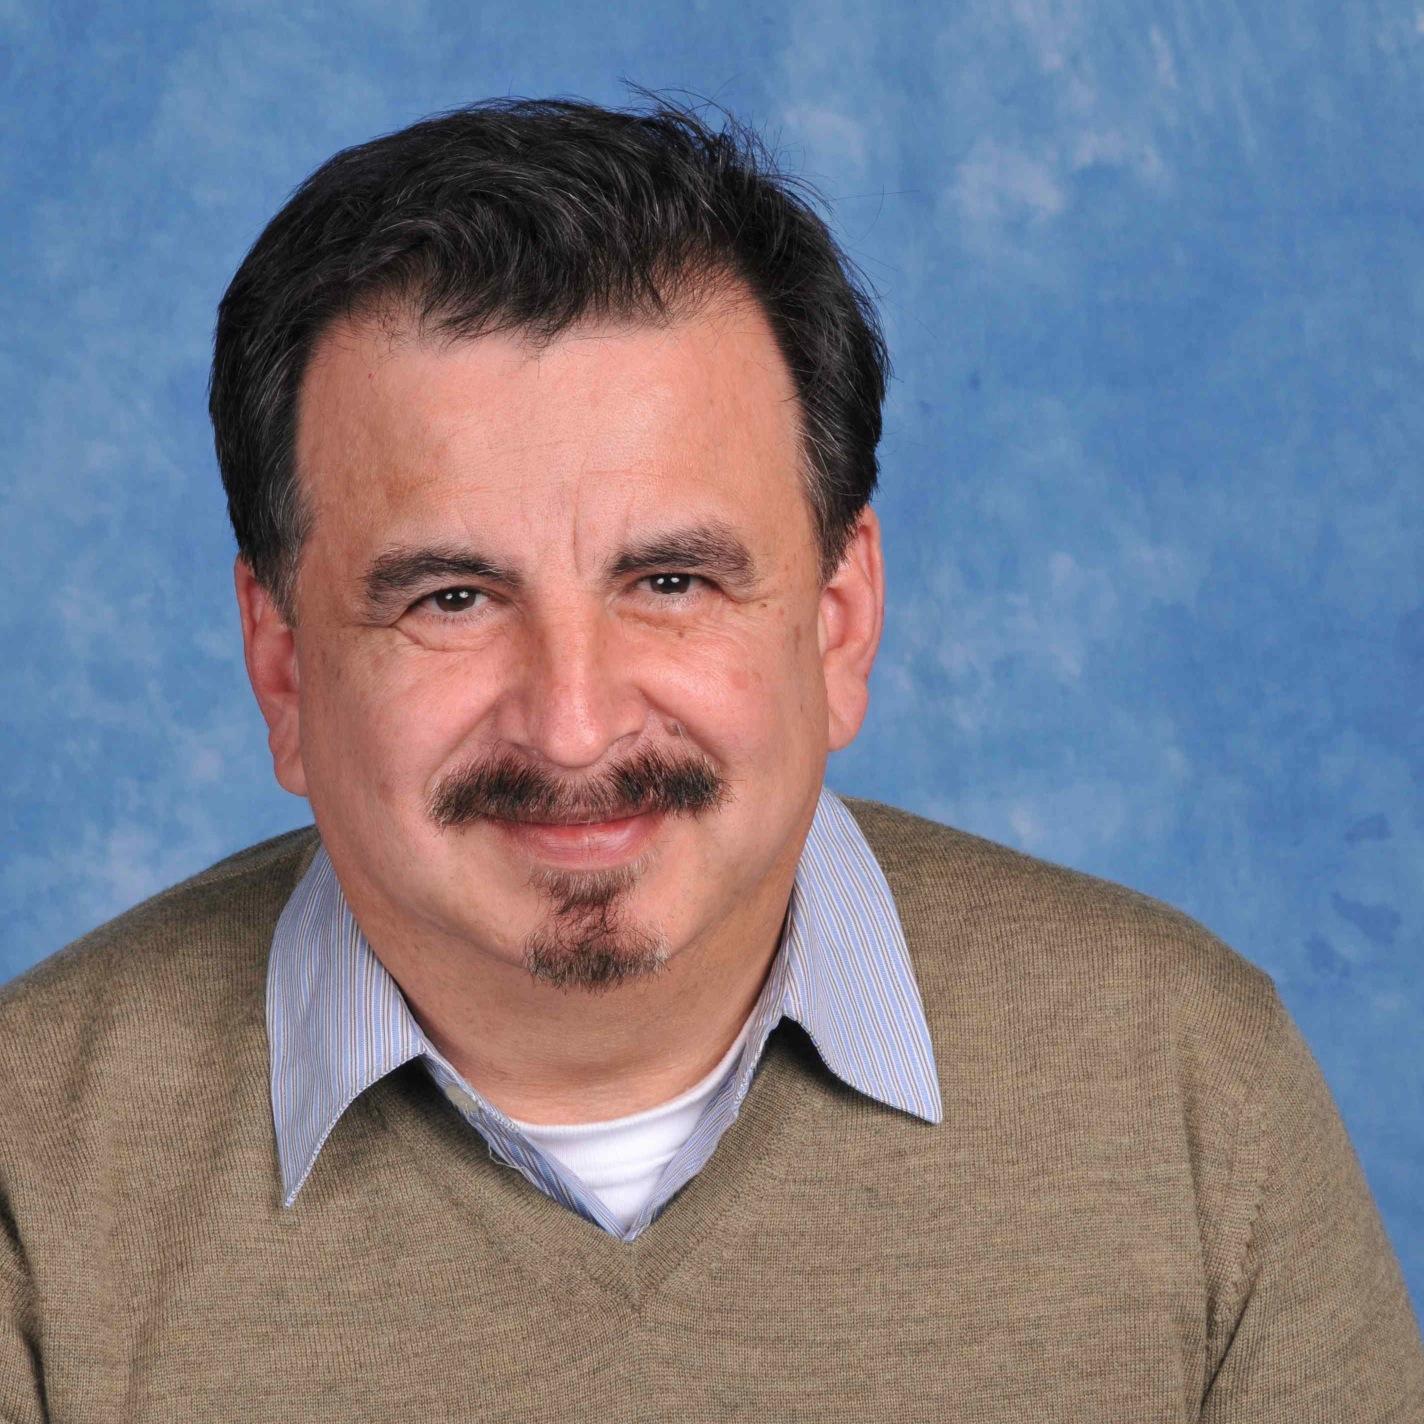 Photo of James Rojas; centered; mustache; goatee; beige sweater; light blue collared shirt.